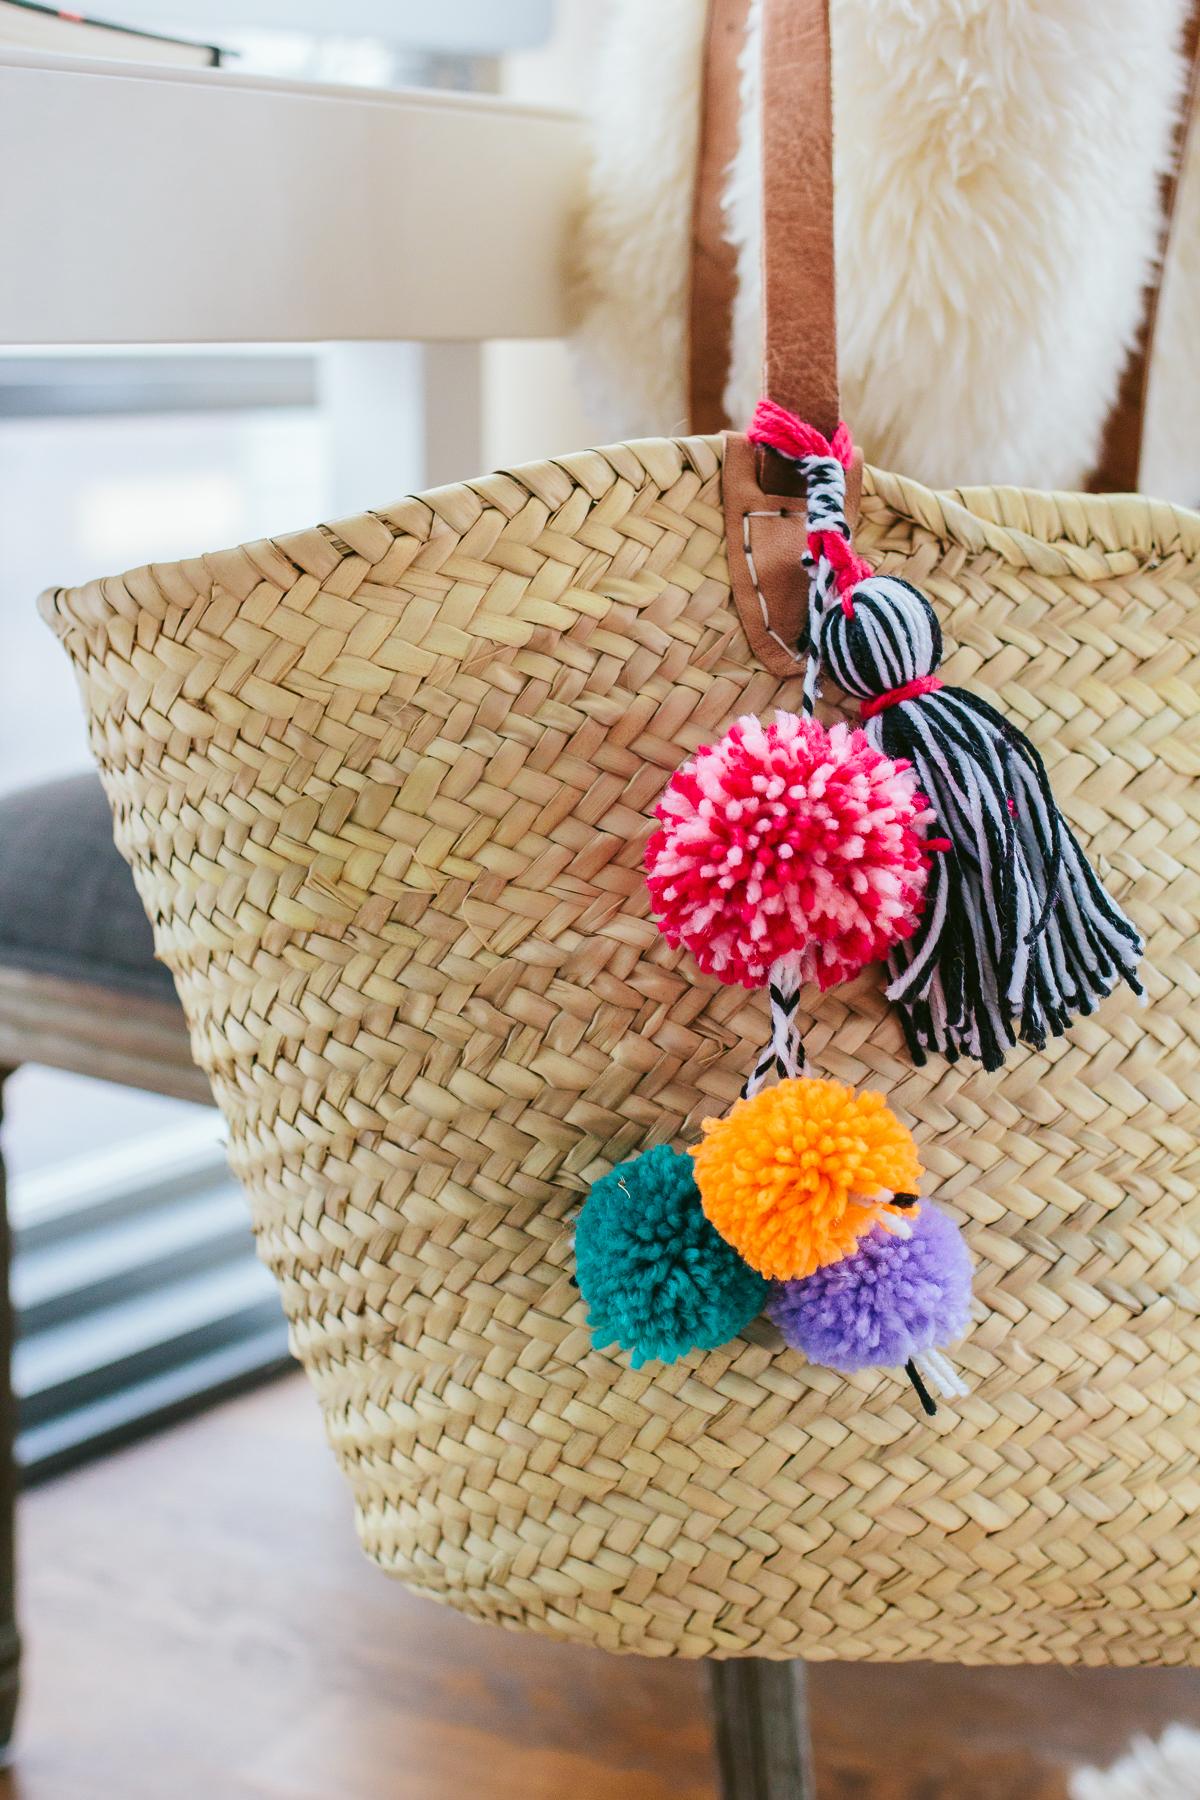 DIY Pom Pom Beach Bag, DIY Tassel Beach Bag, easy diy project, straw beach bag —via @TheFoxandShe